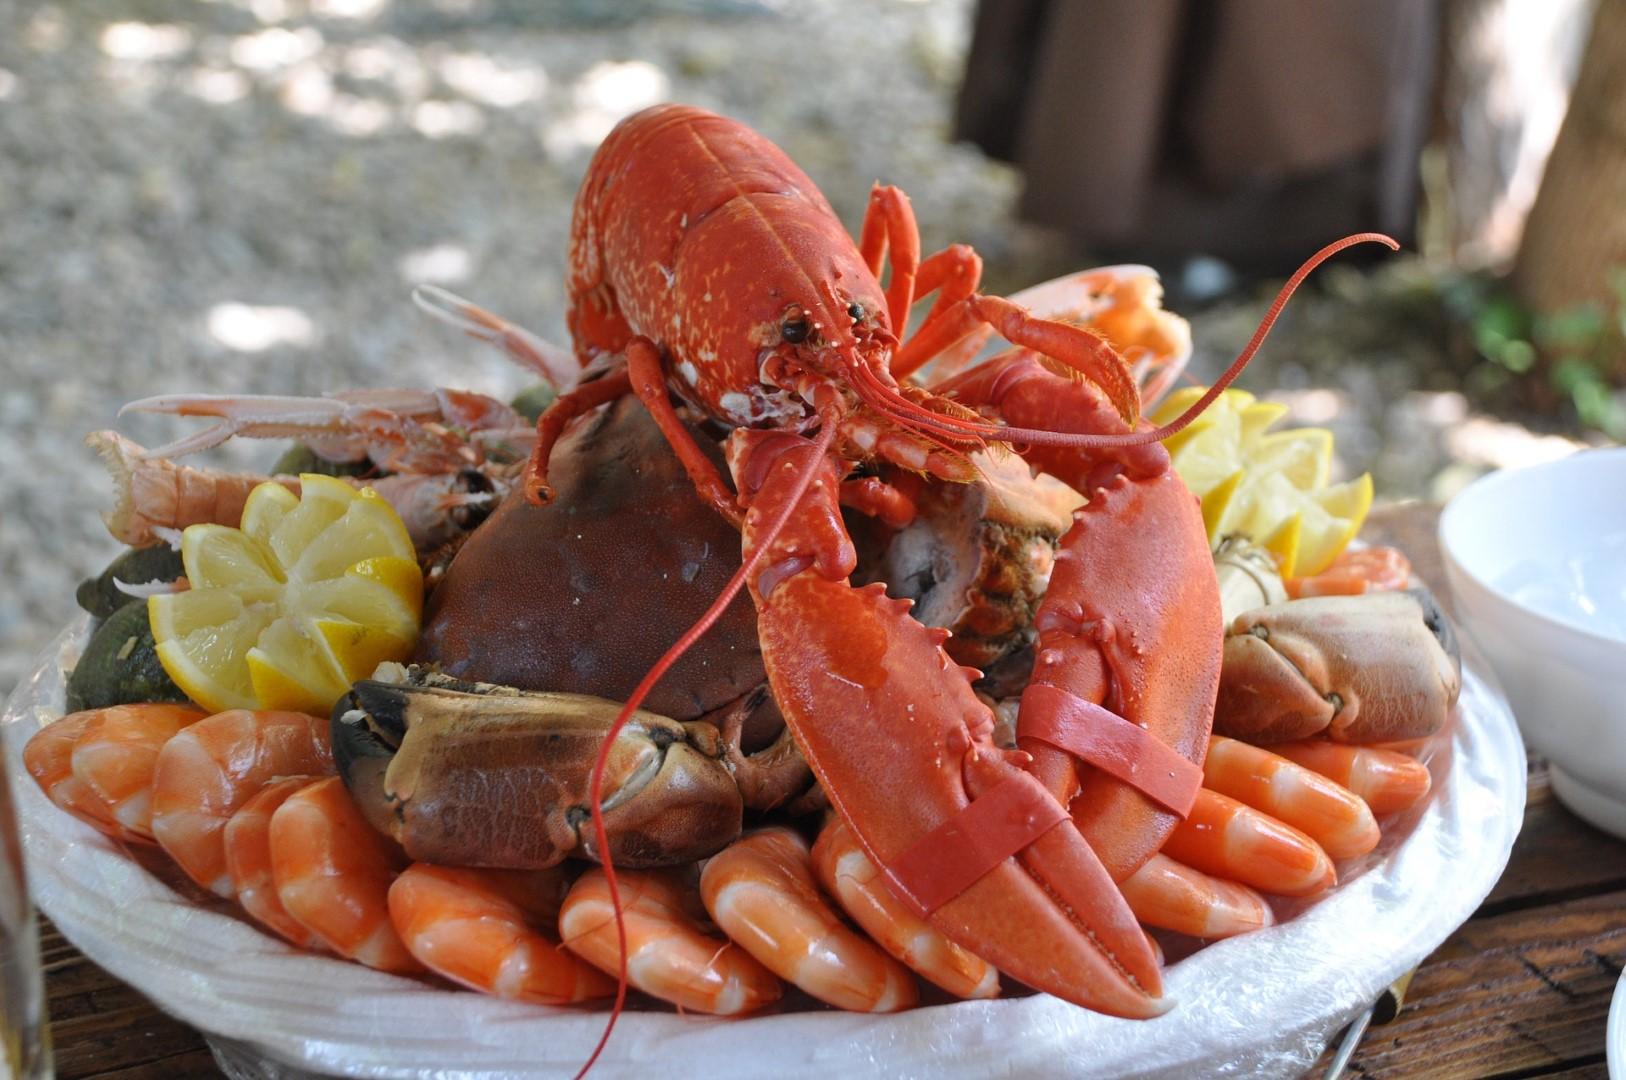 Main seafood